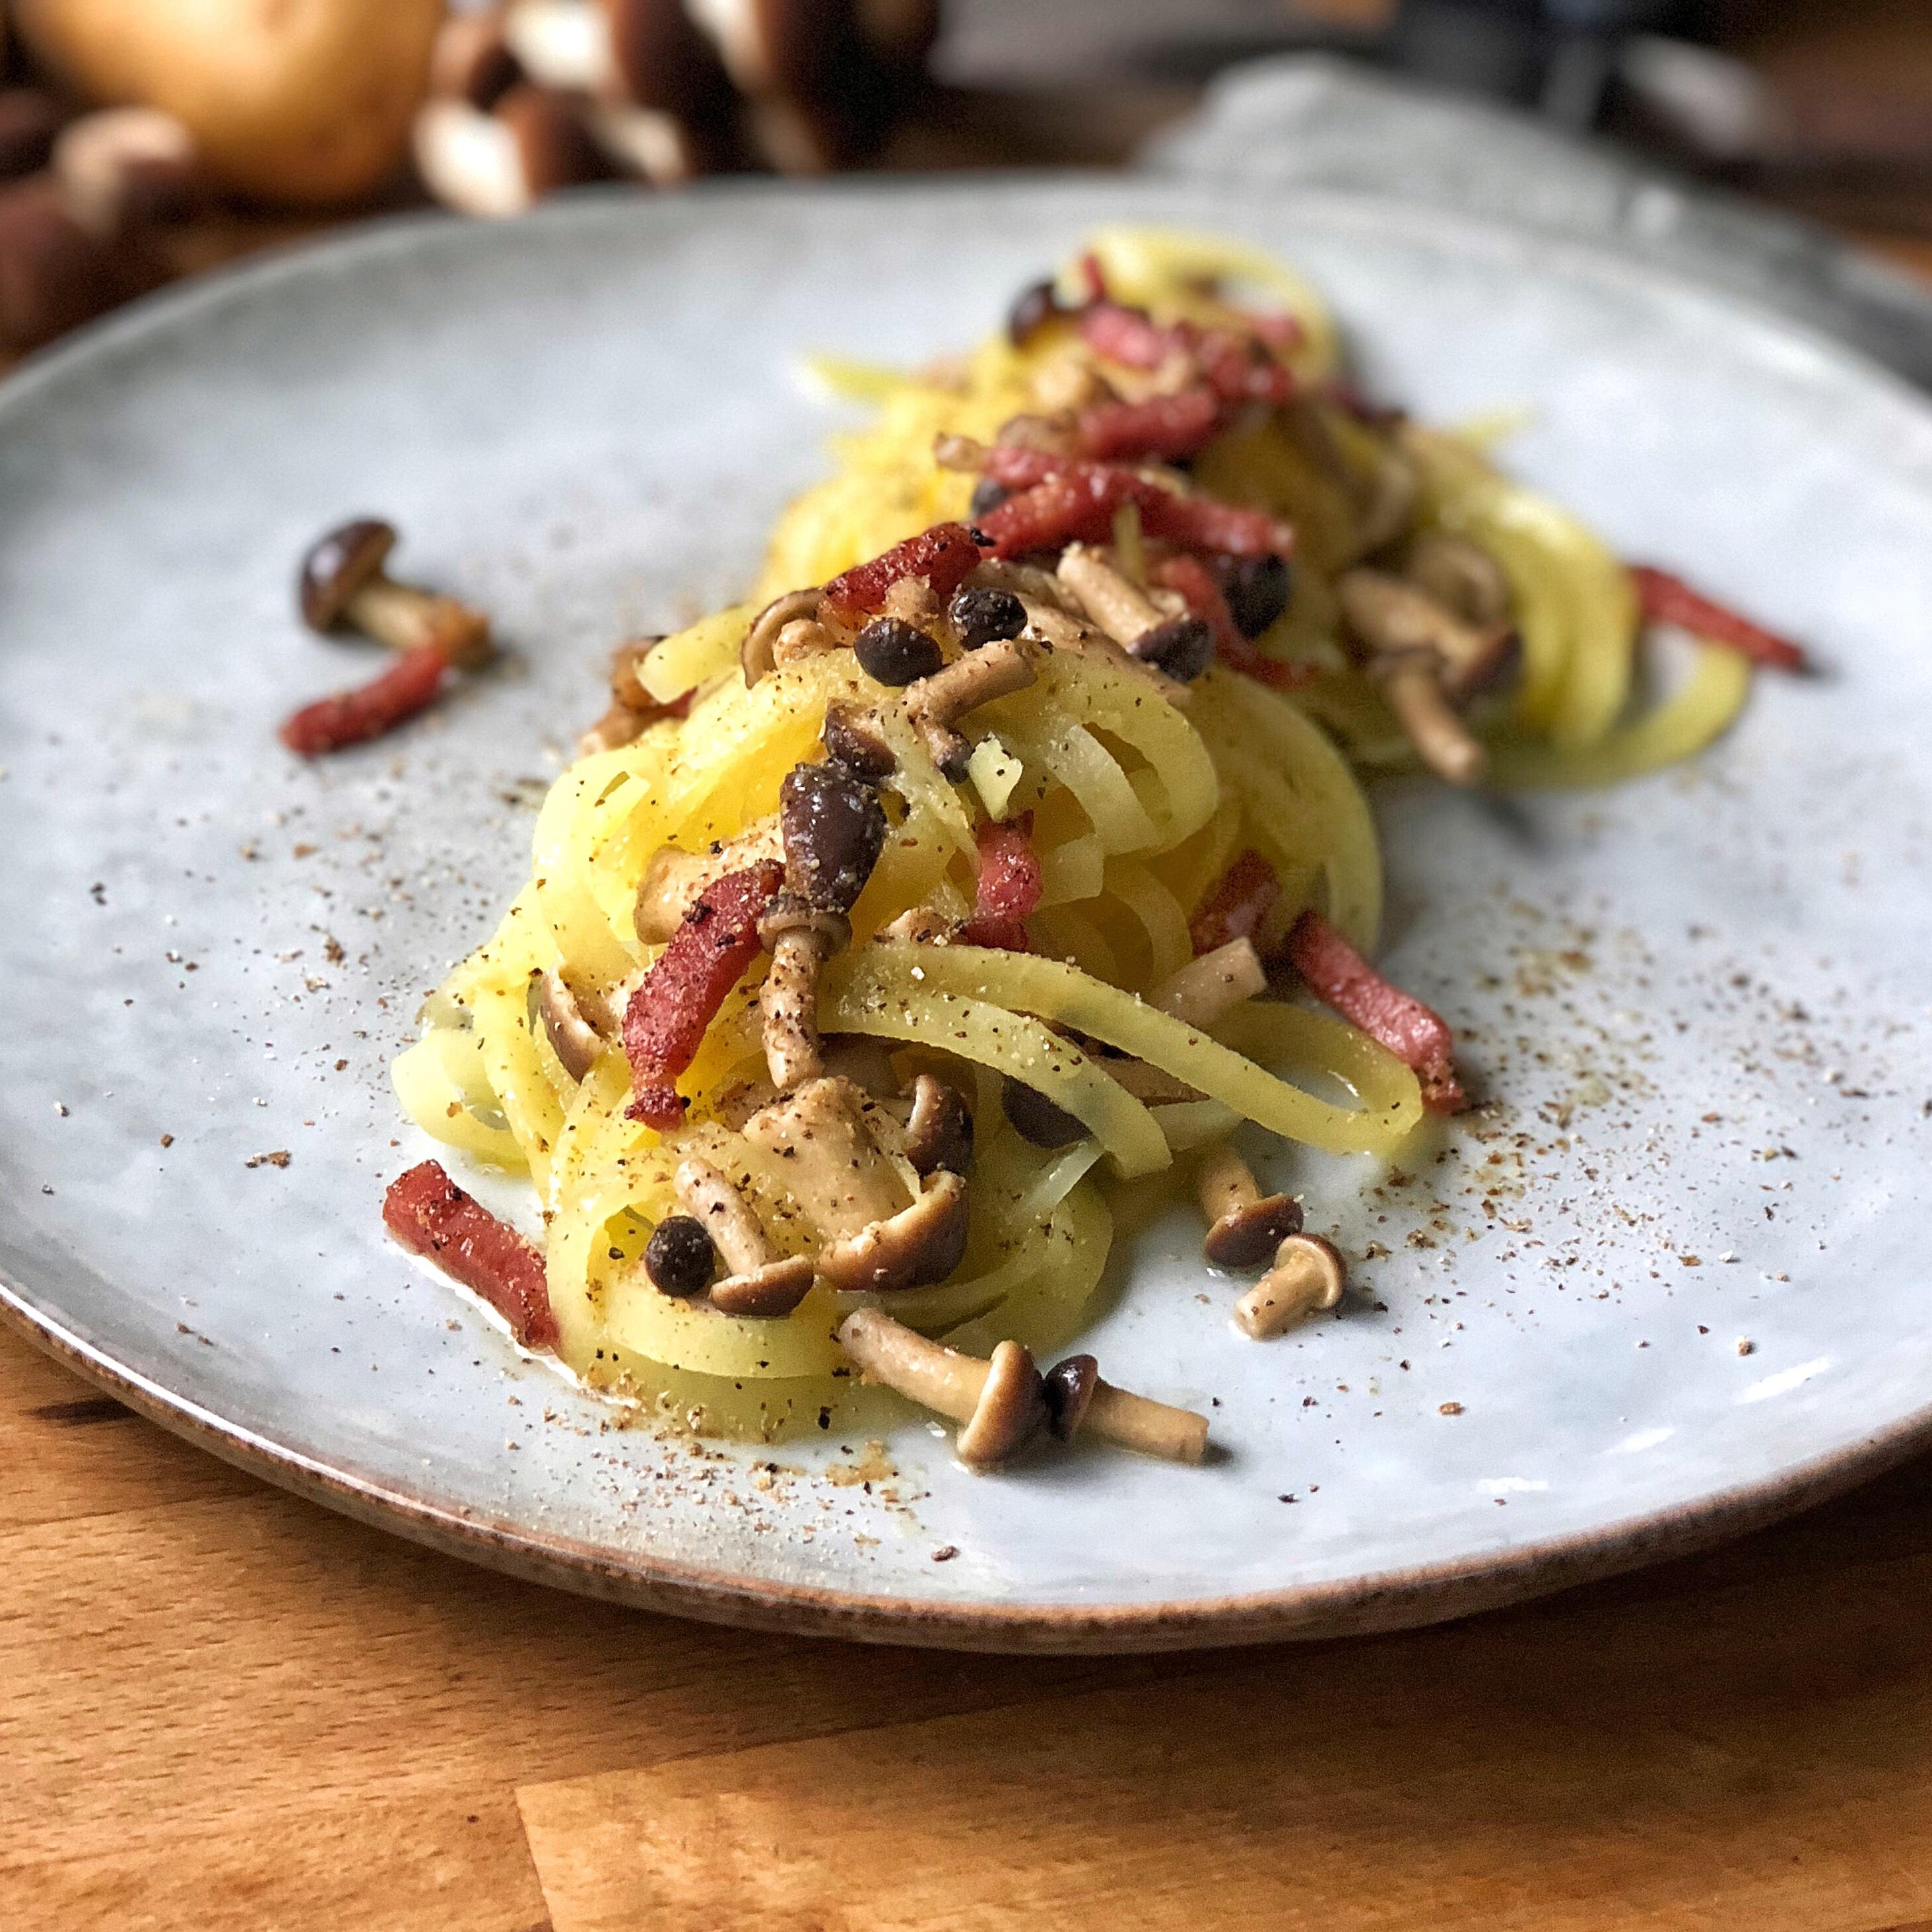 Spaghetti di patate ai funghi e speck